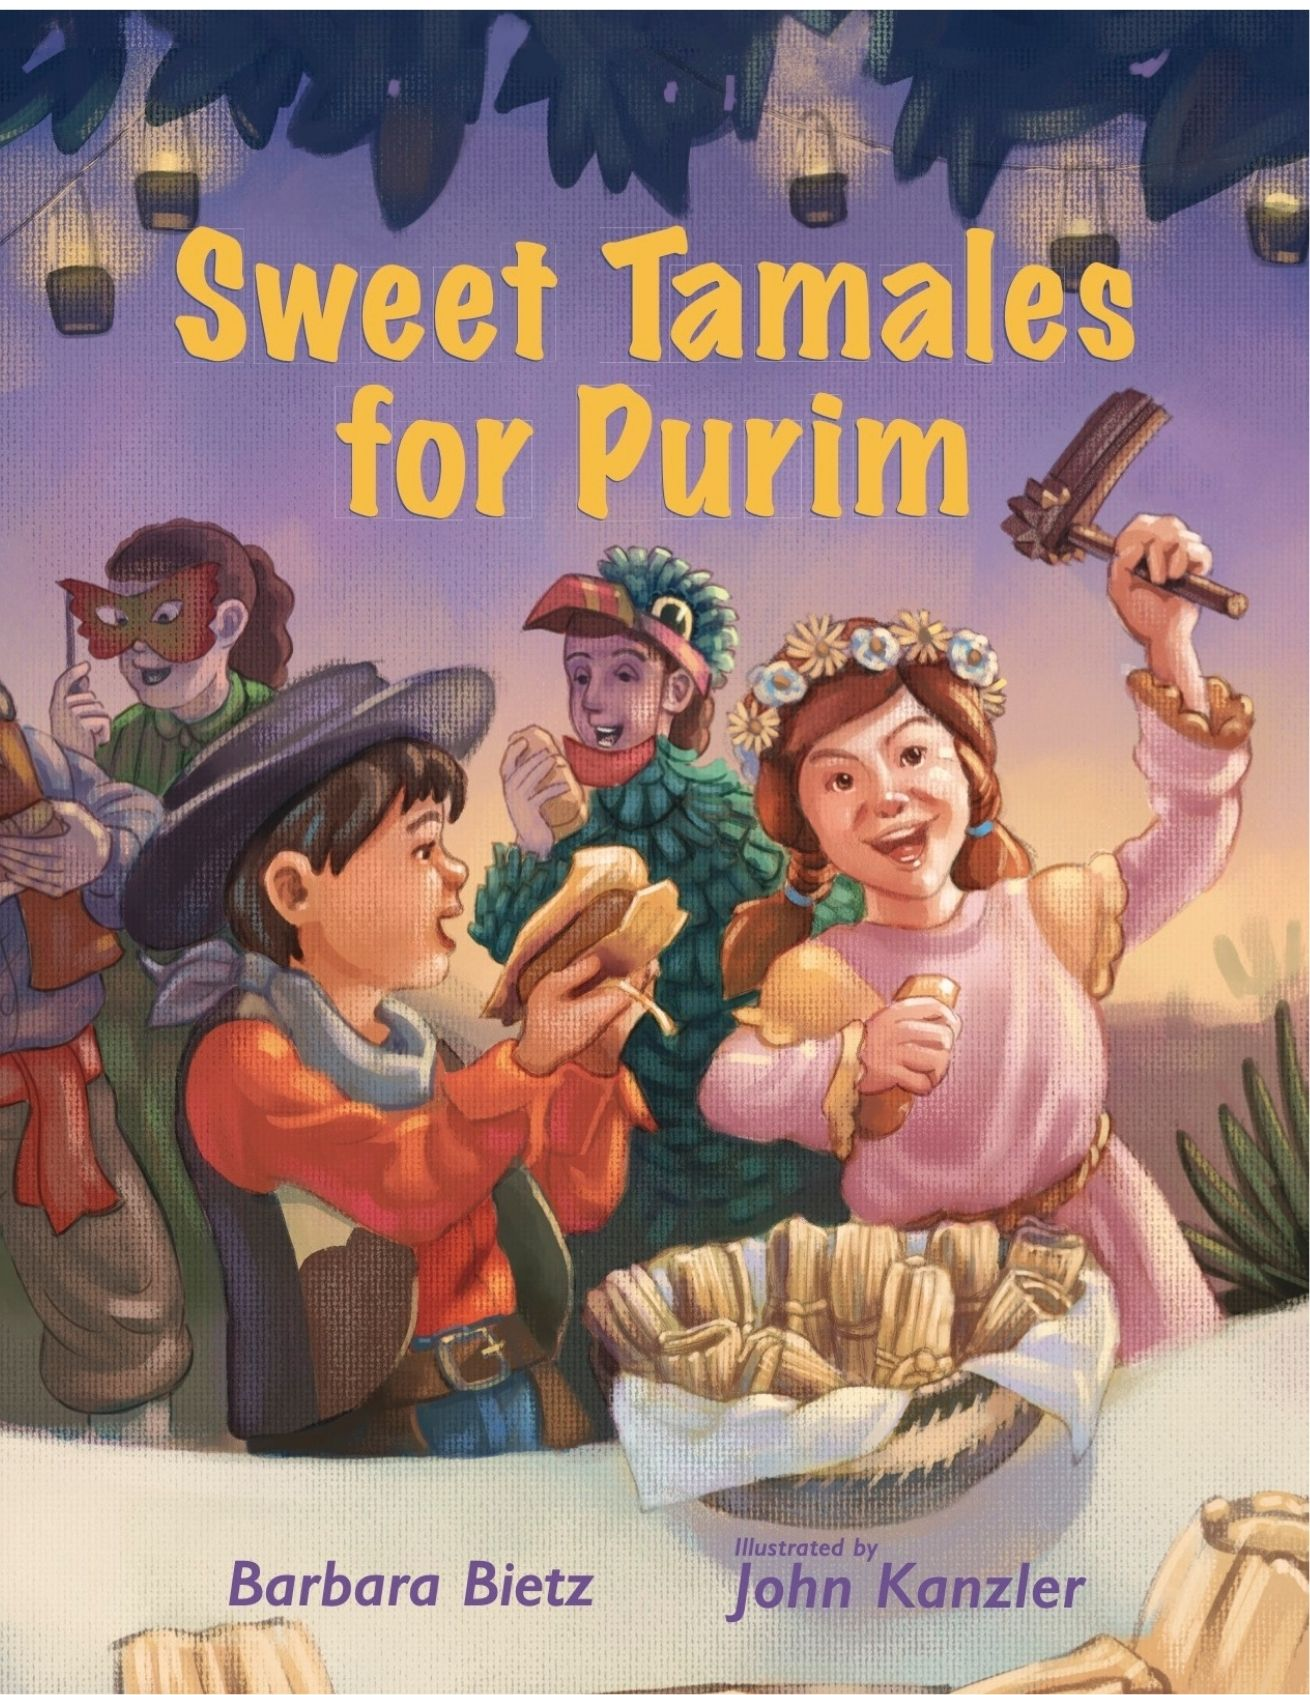 Sweet Tamales for Purim